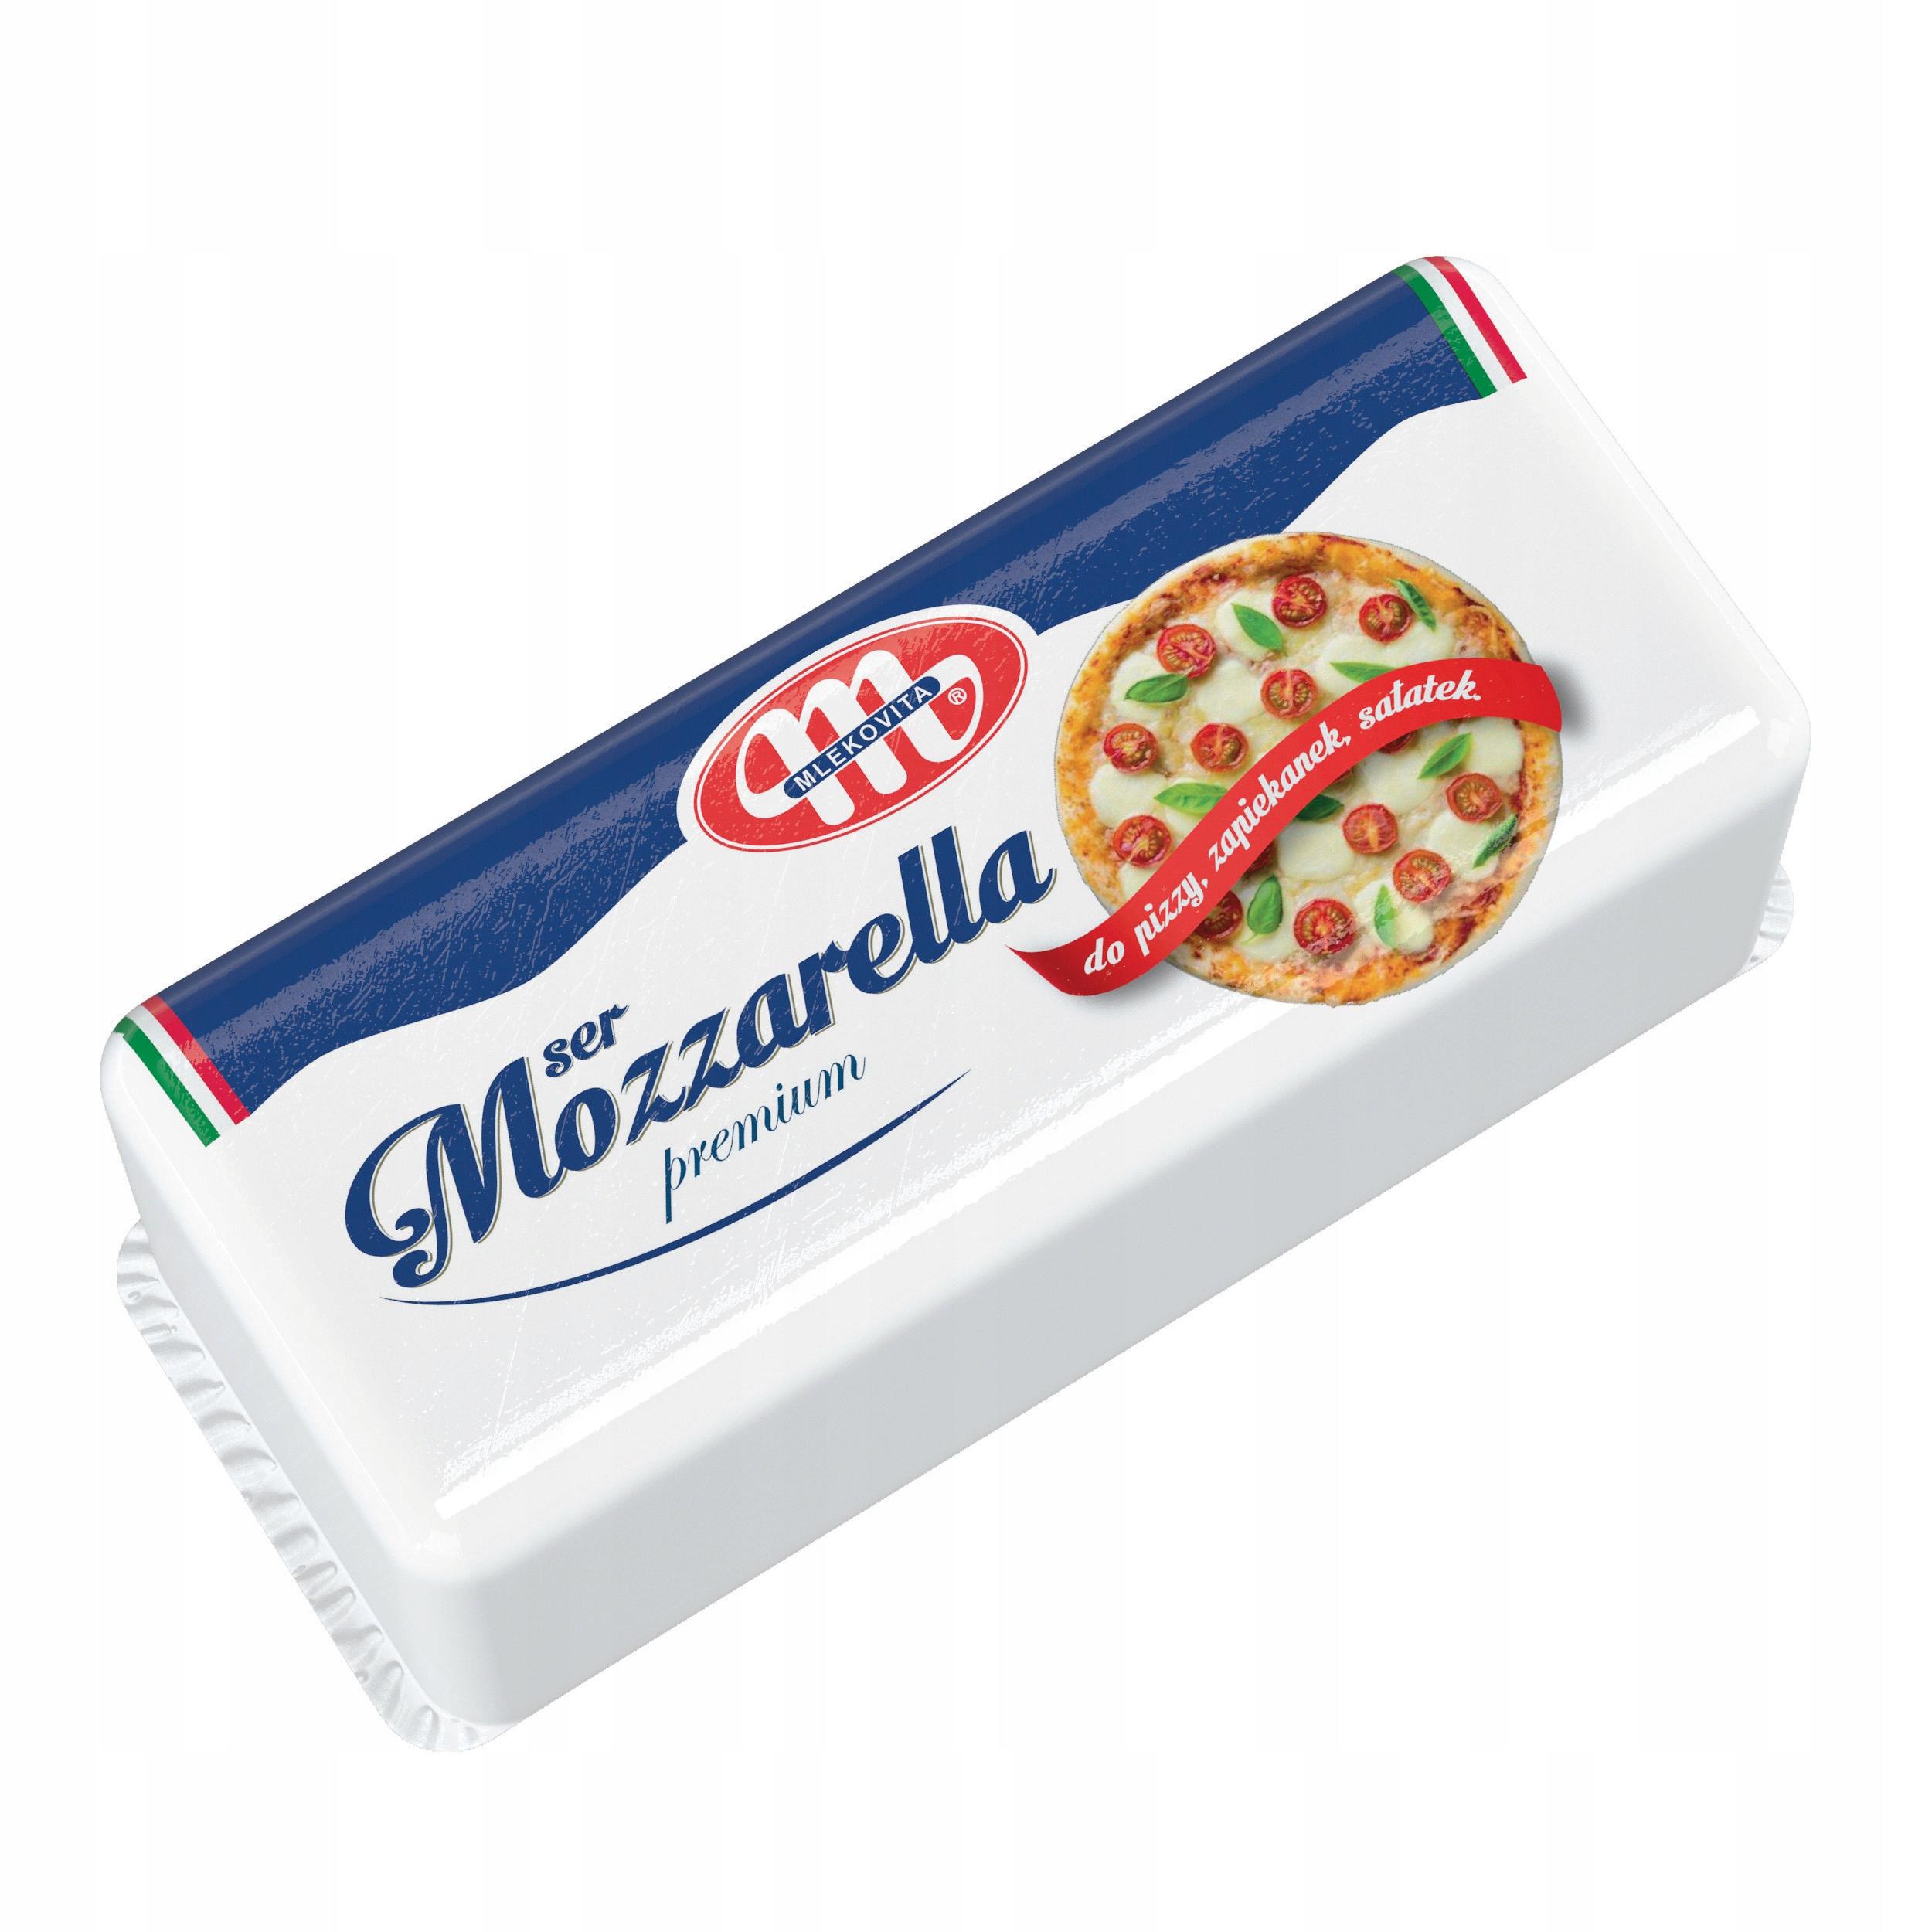 Ser Mozzarella blok 2,5 kg Mlecovita